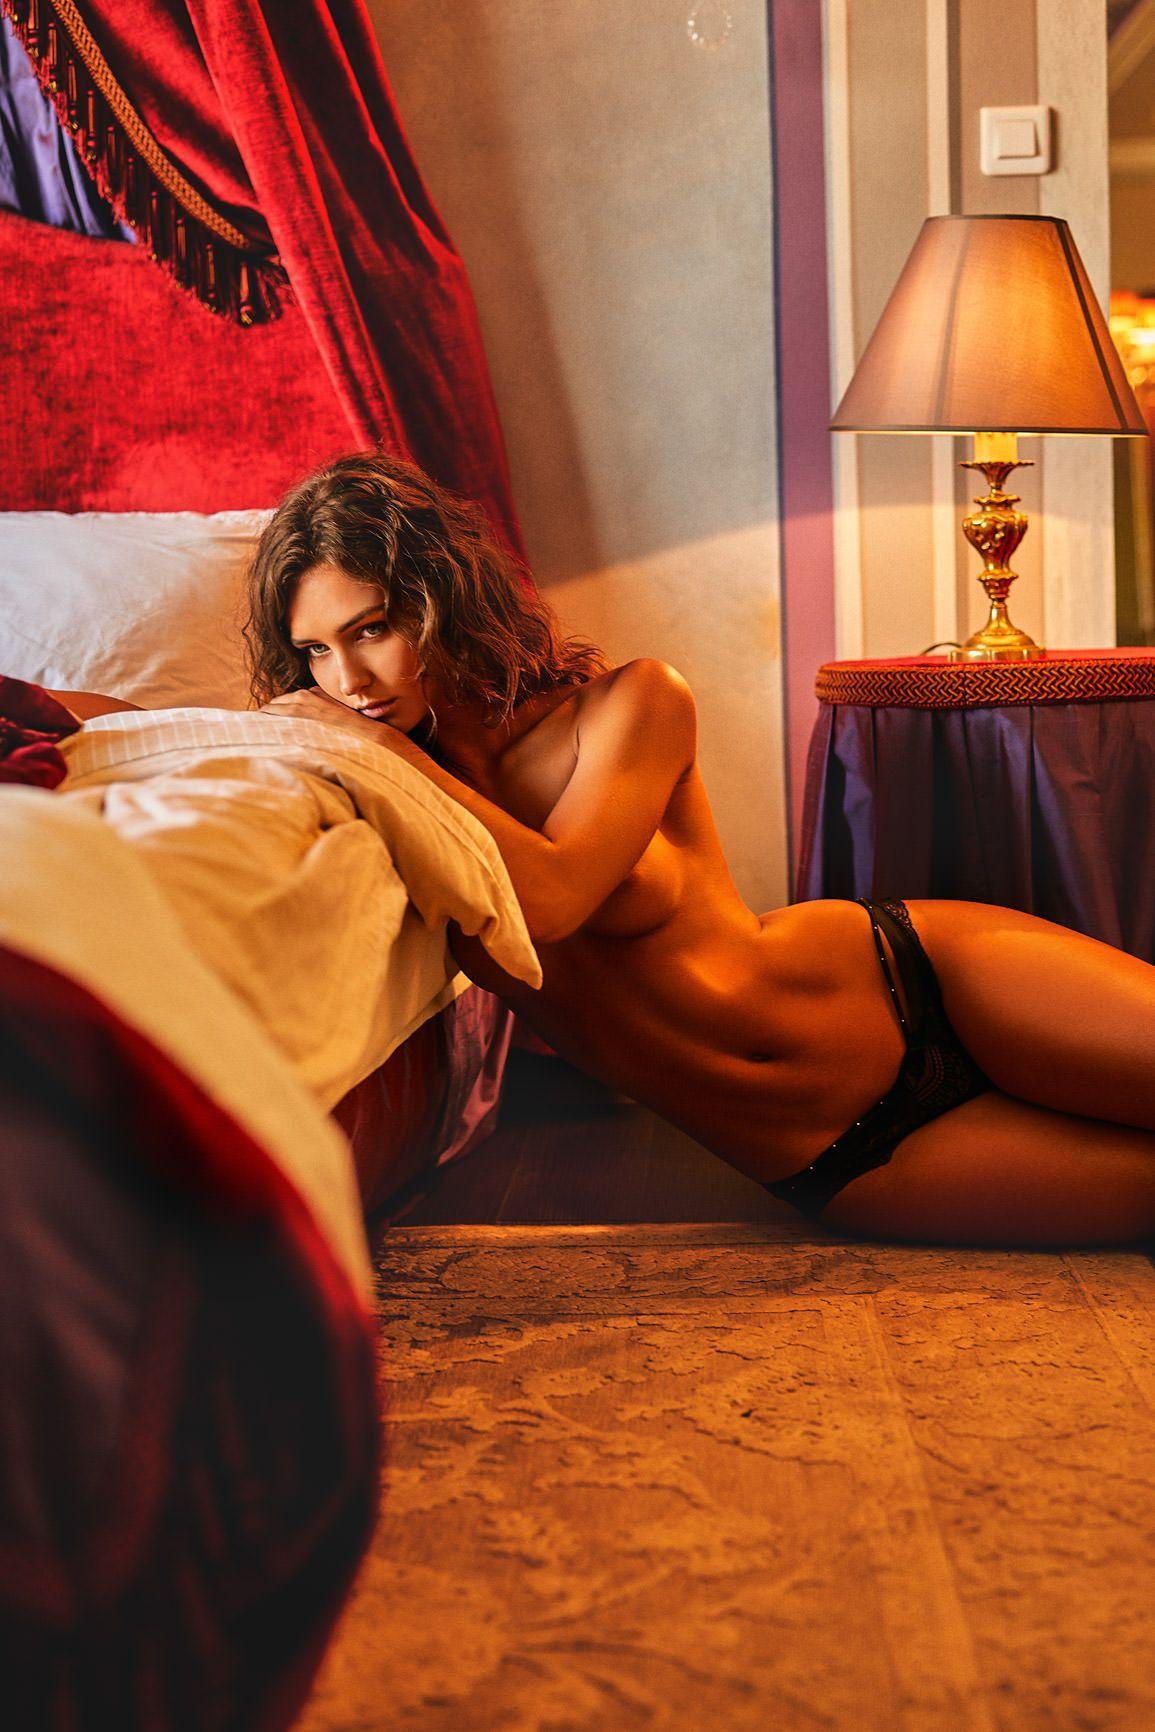 Rachel Cook Topless (9 Photos) 5